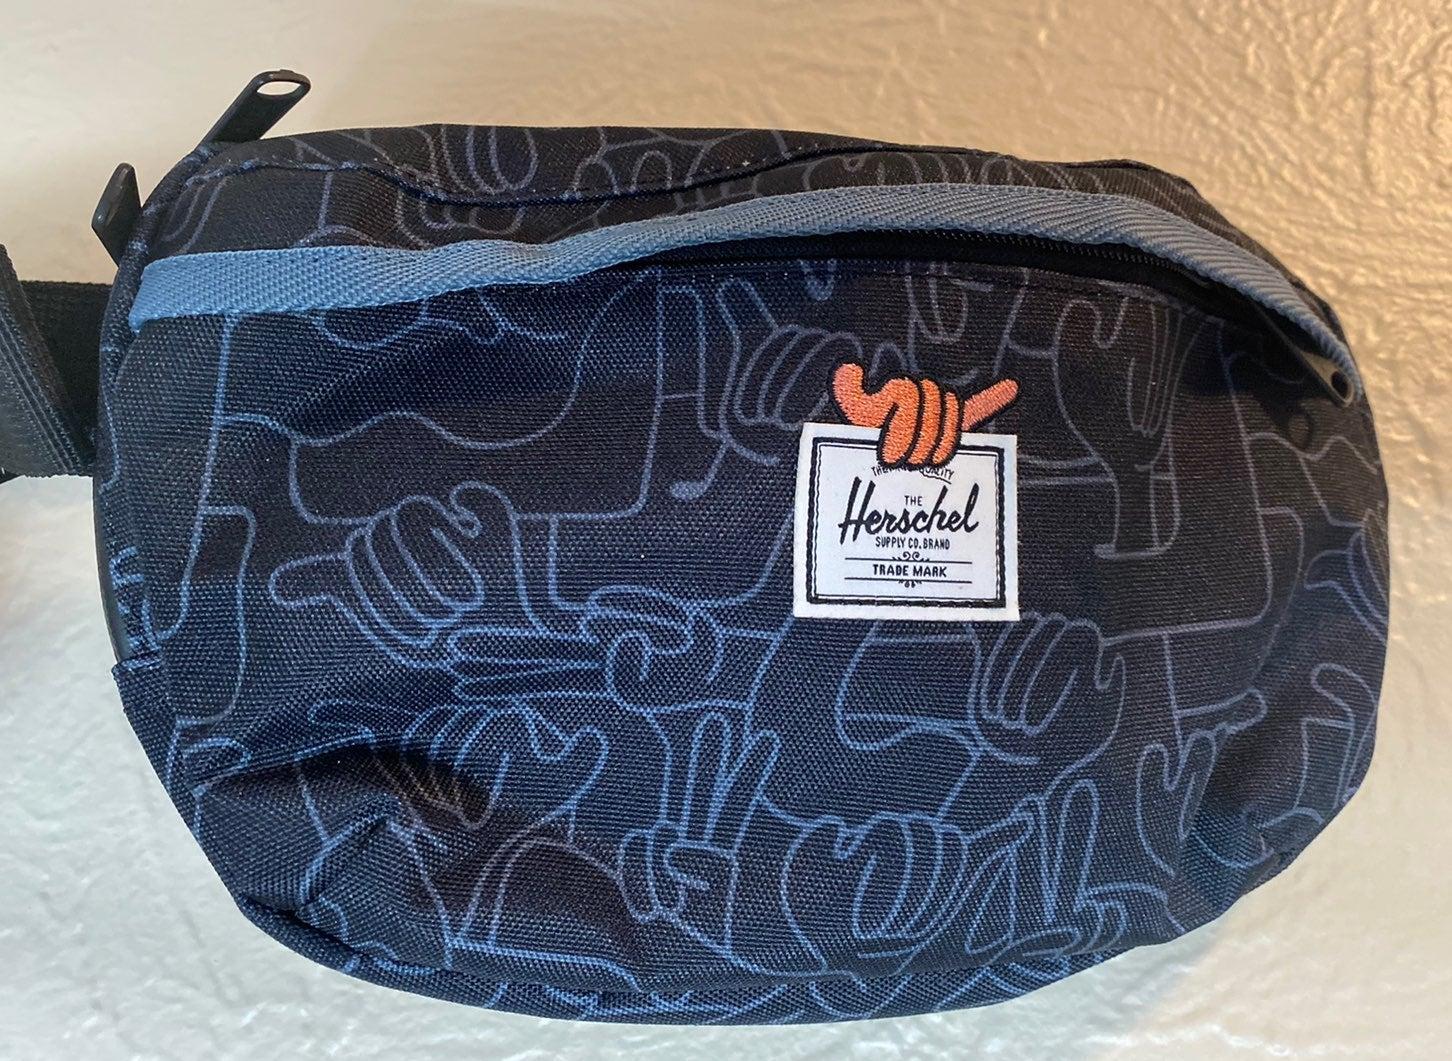 Herschel supply Company side bag